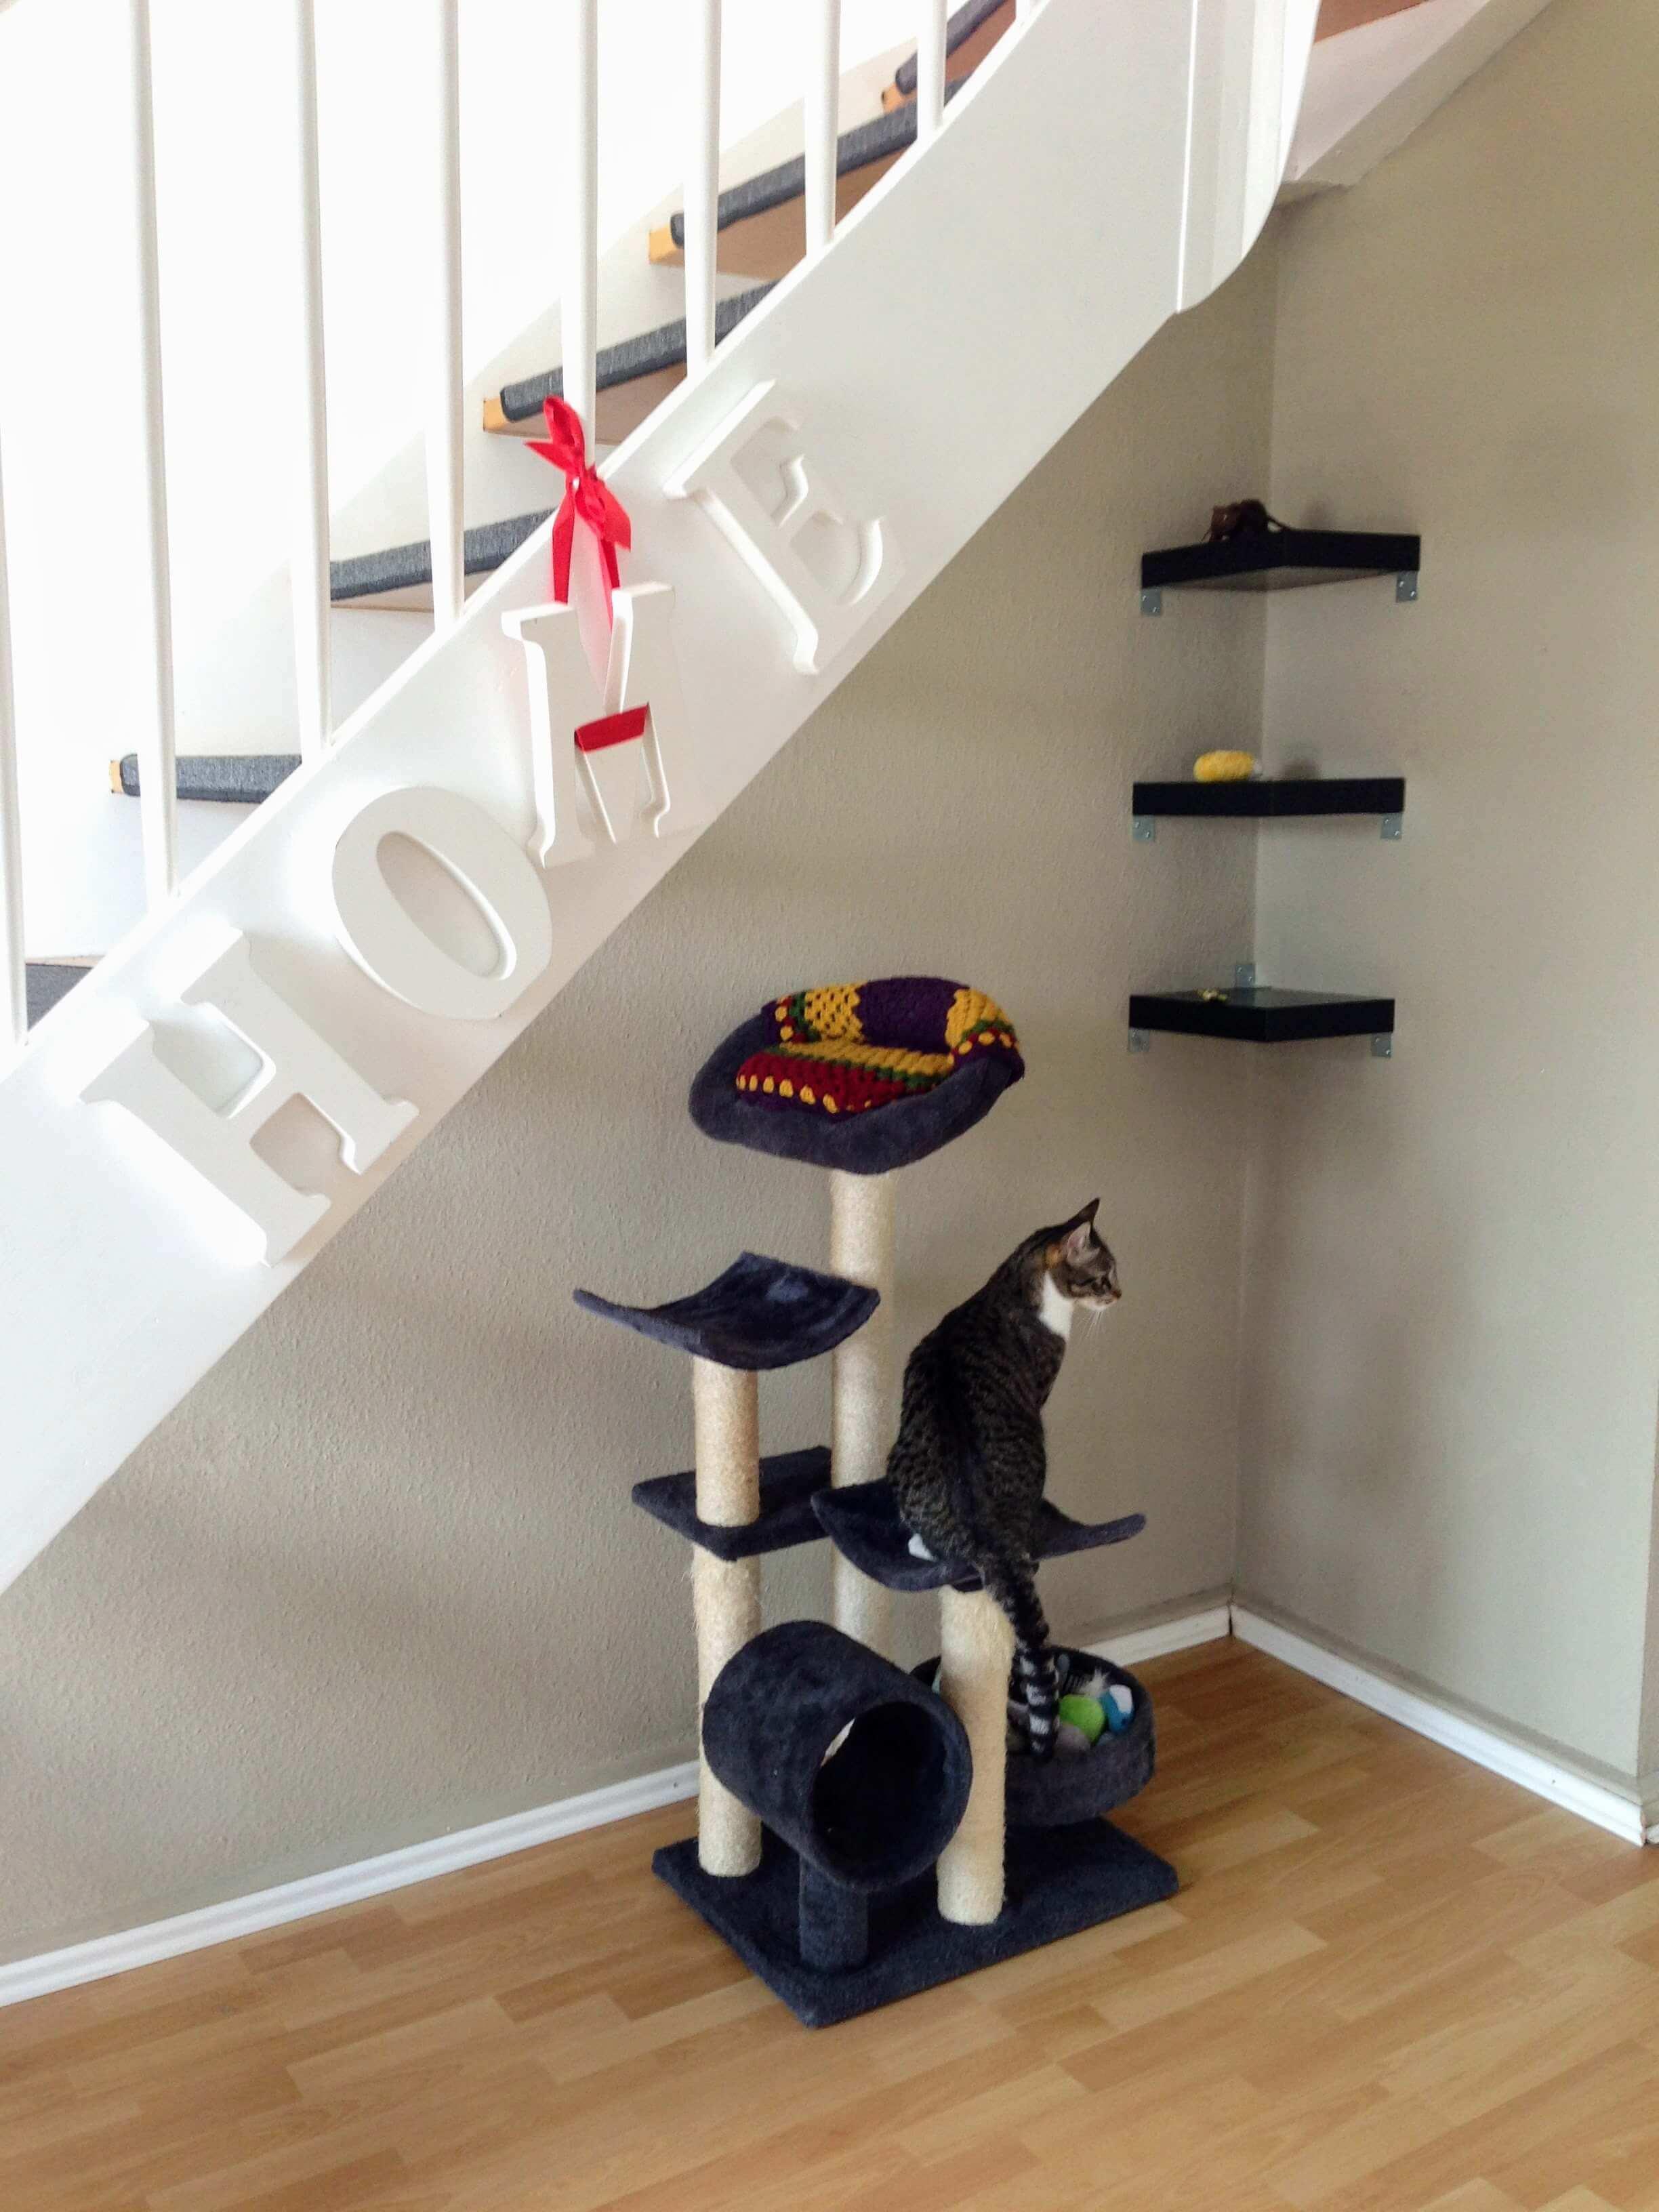 Cmo alquilar un piso excellent trmites alquilar piso with for Alquilar un piso